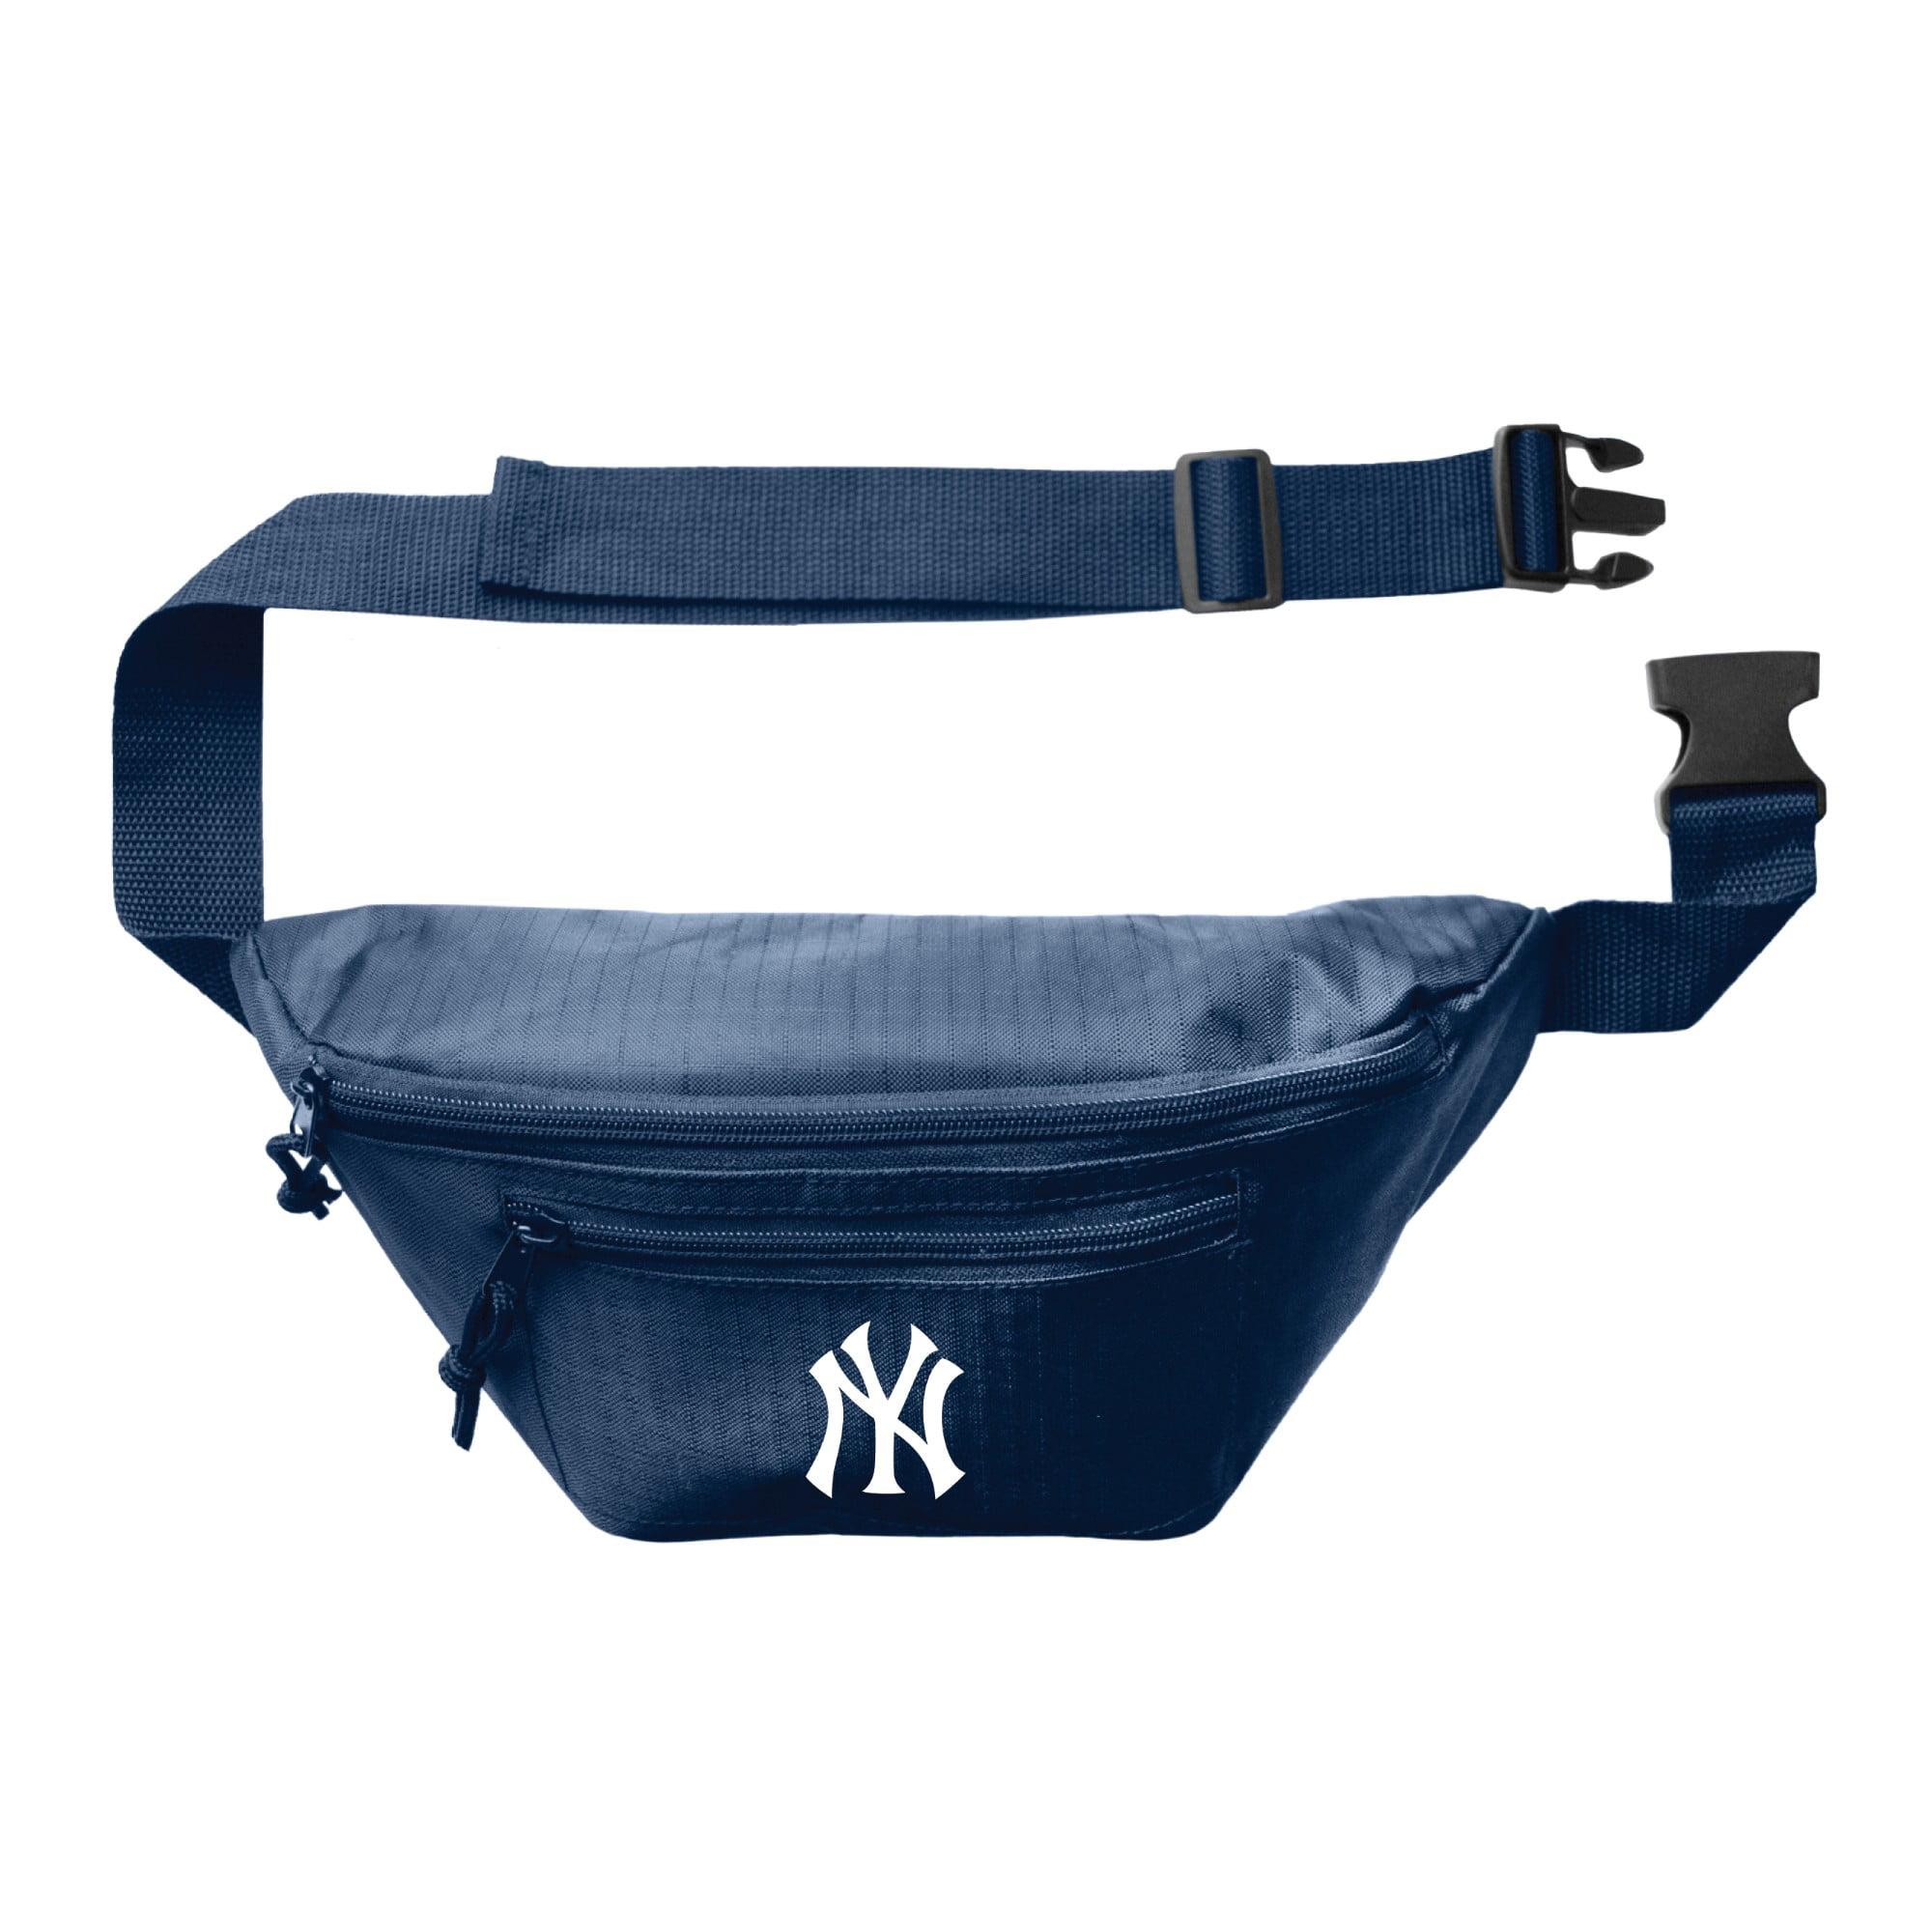 MLB Little Earth 3 Zip Hip Pack, New York Yankees